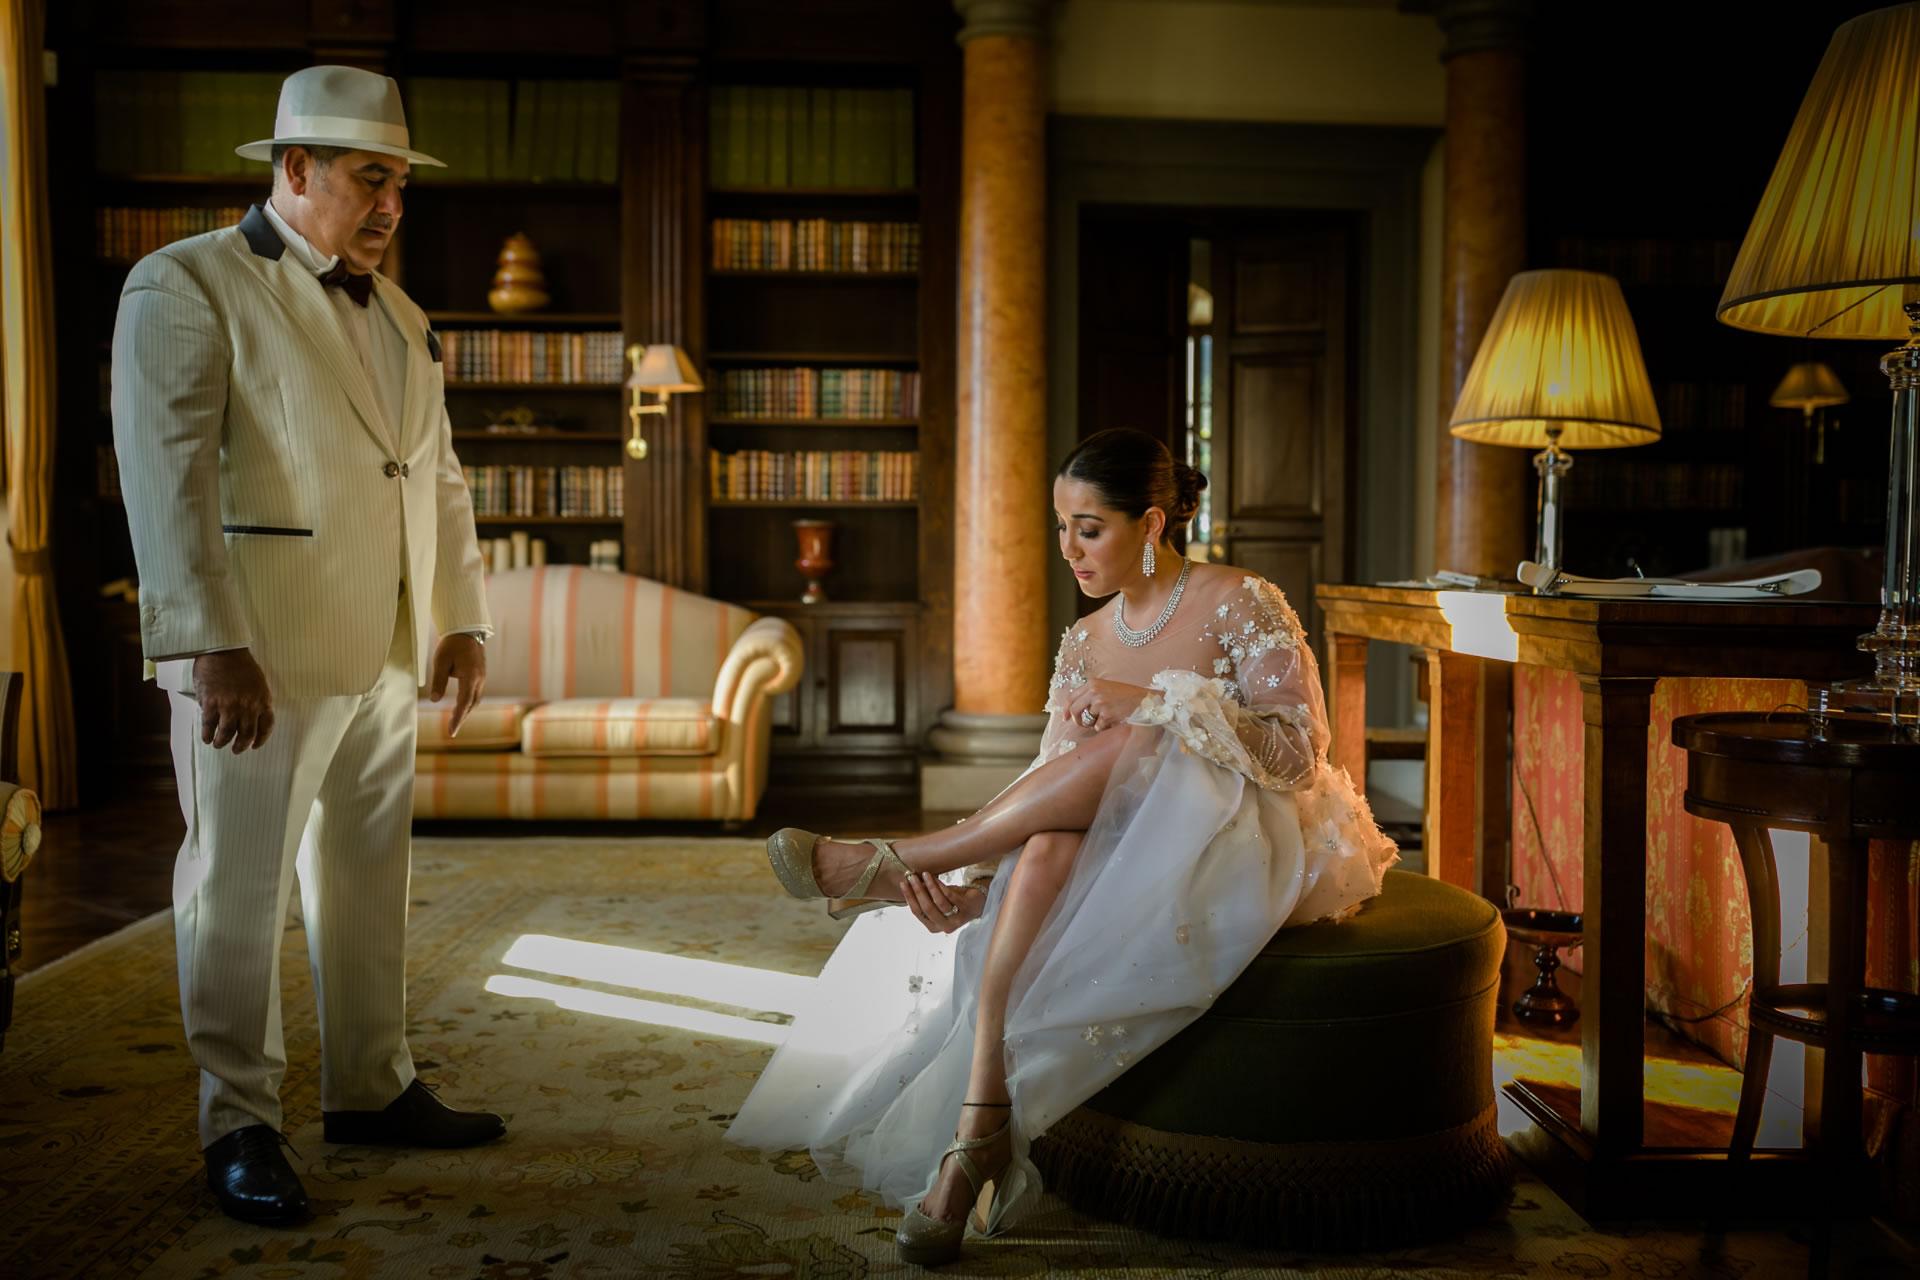 Father - 11 :: Luxury wedding at Il Borro :: Luxury wedding photography - 10 :: Father - 11